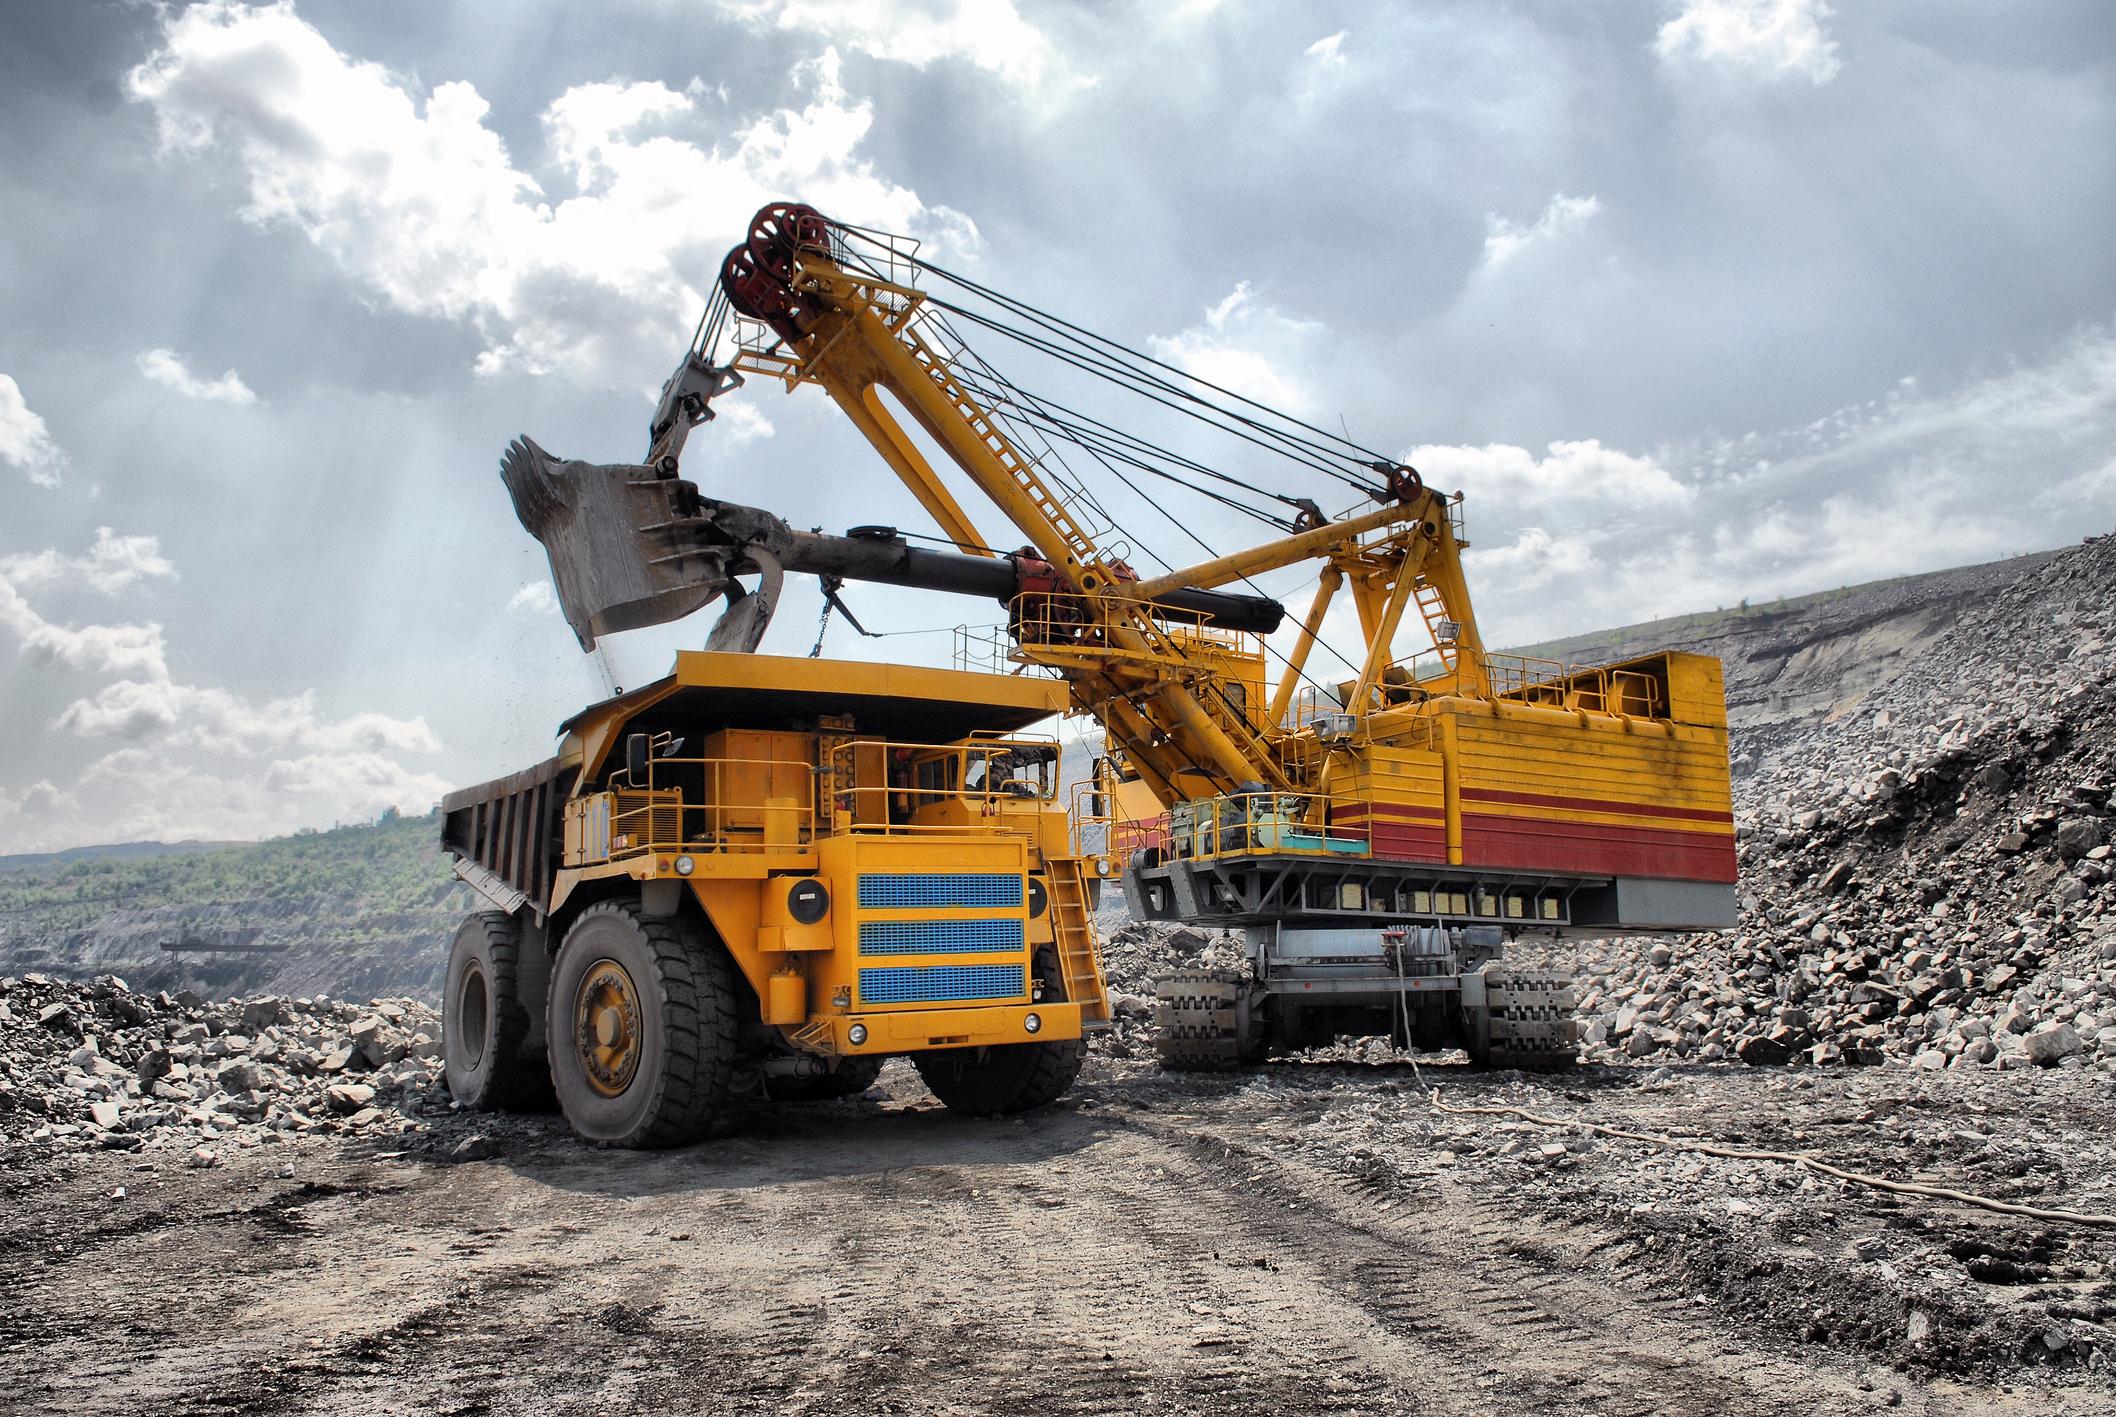 An excavator loading a dump truck in an open-pit coal mine.